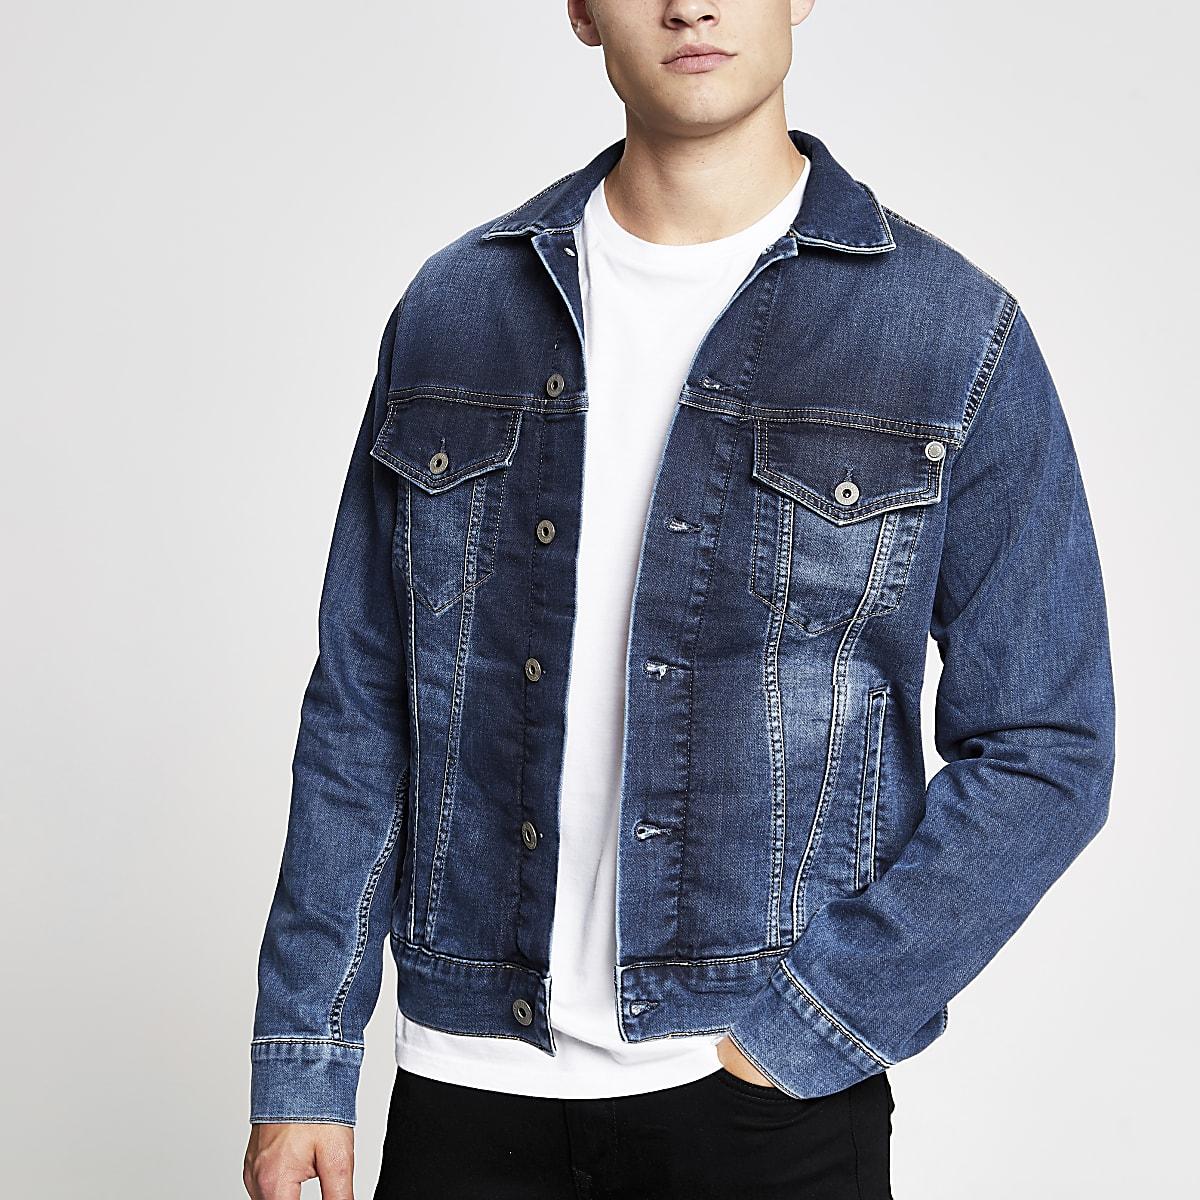 Pepe Jeans – Veste en denim bleue